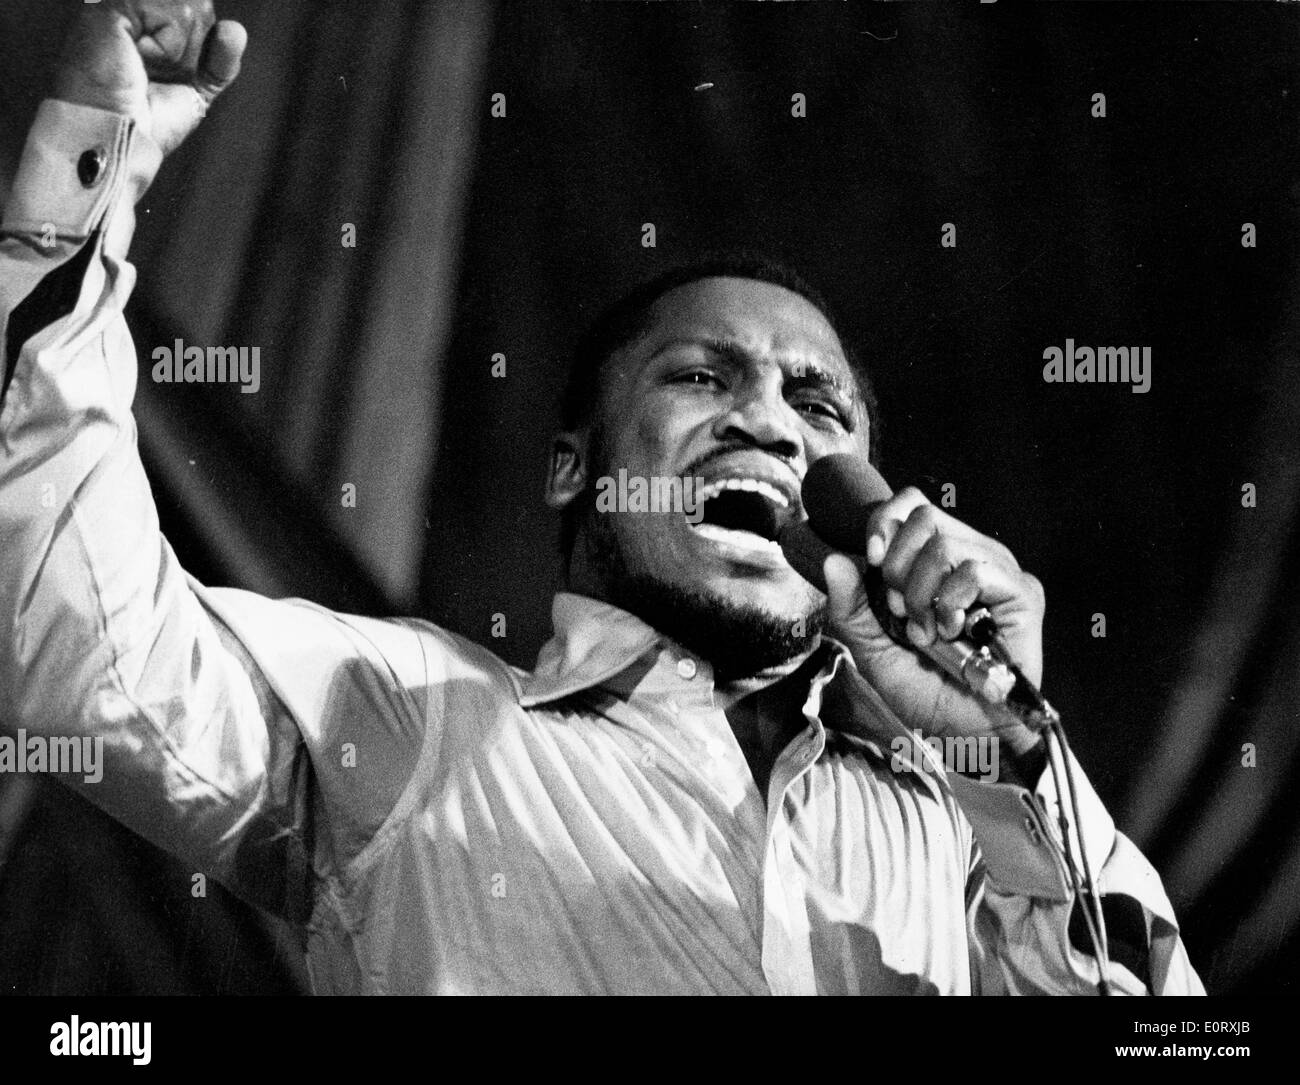 Boxer Smokin' Joe Frazier on stage singing - Stock Image